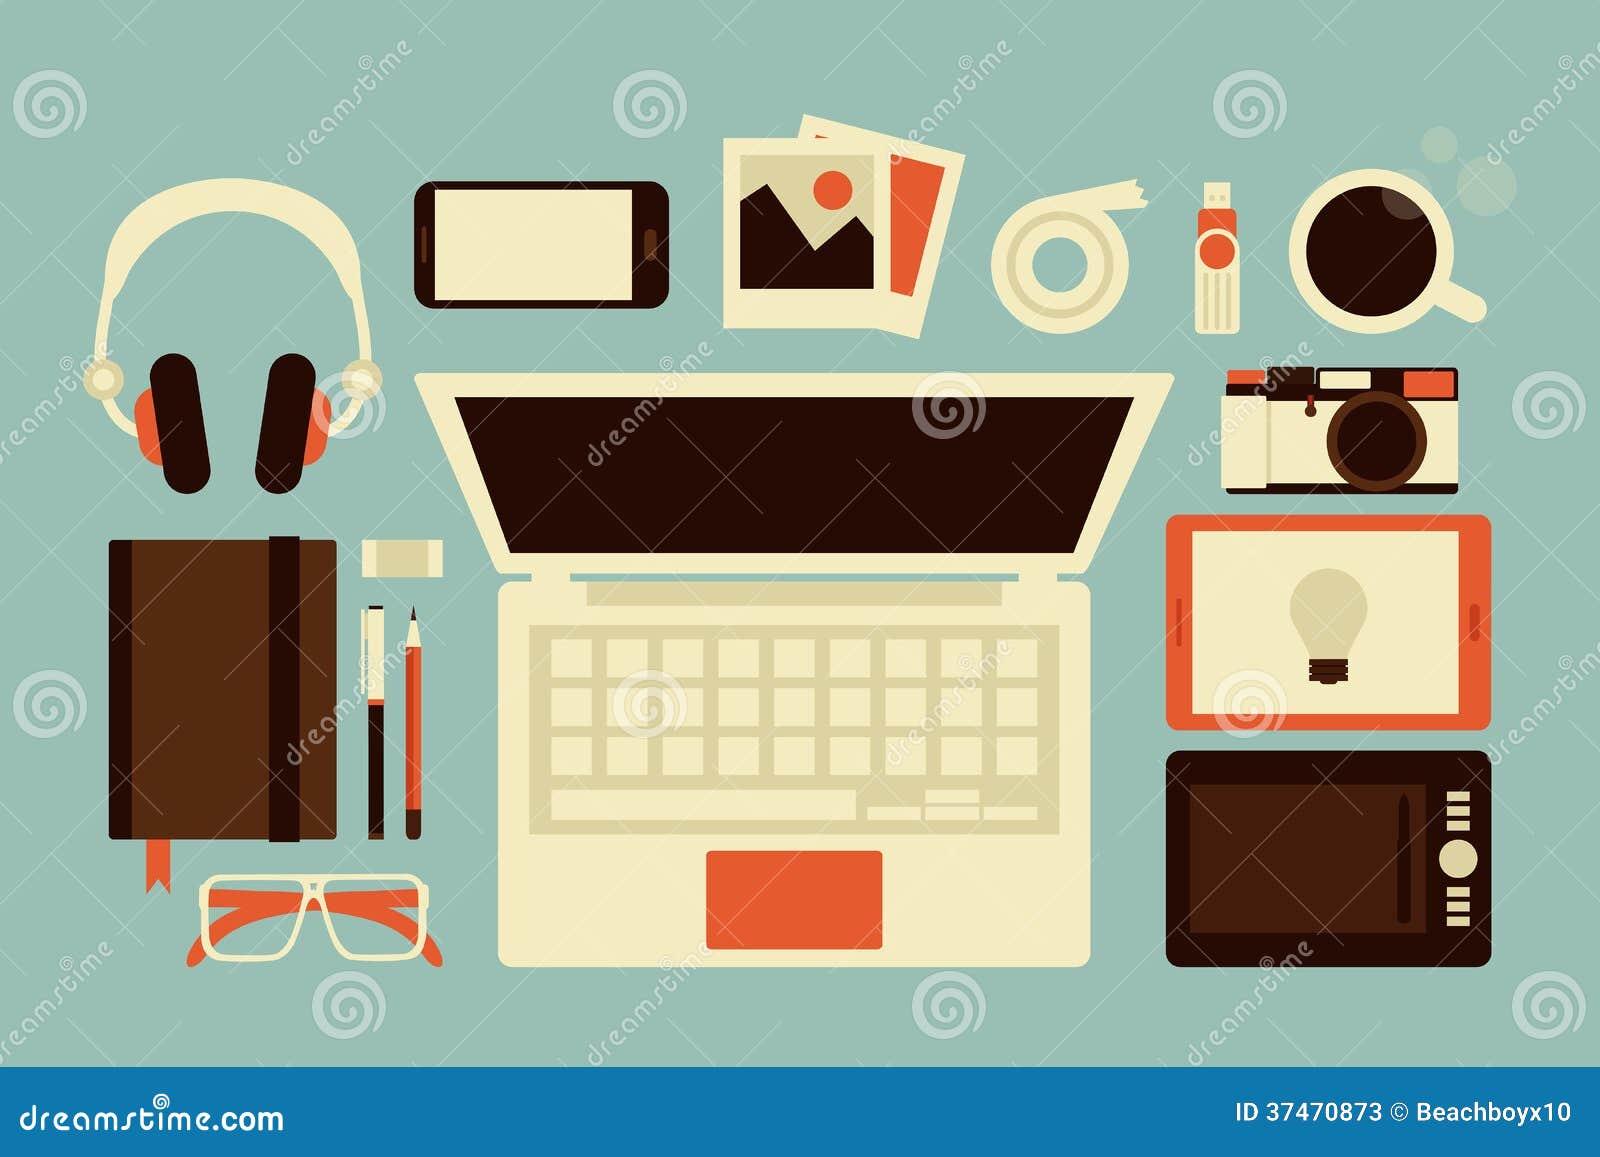 graphic designer desk accessories inspiring children s room and